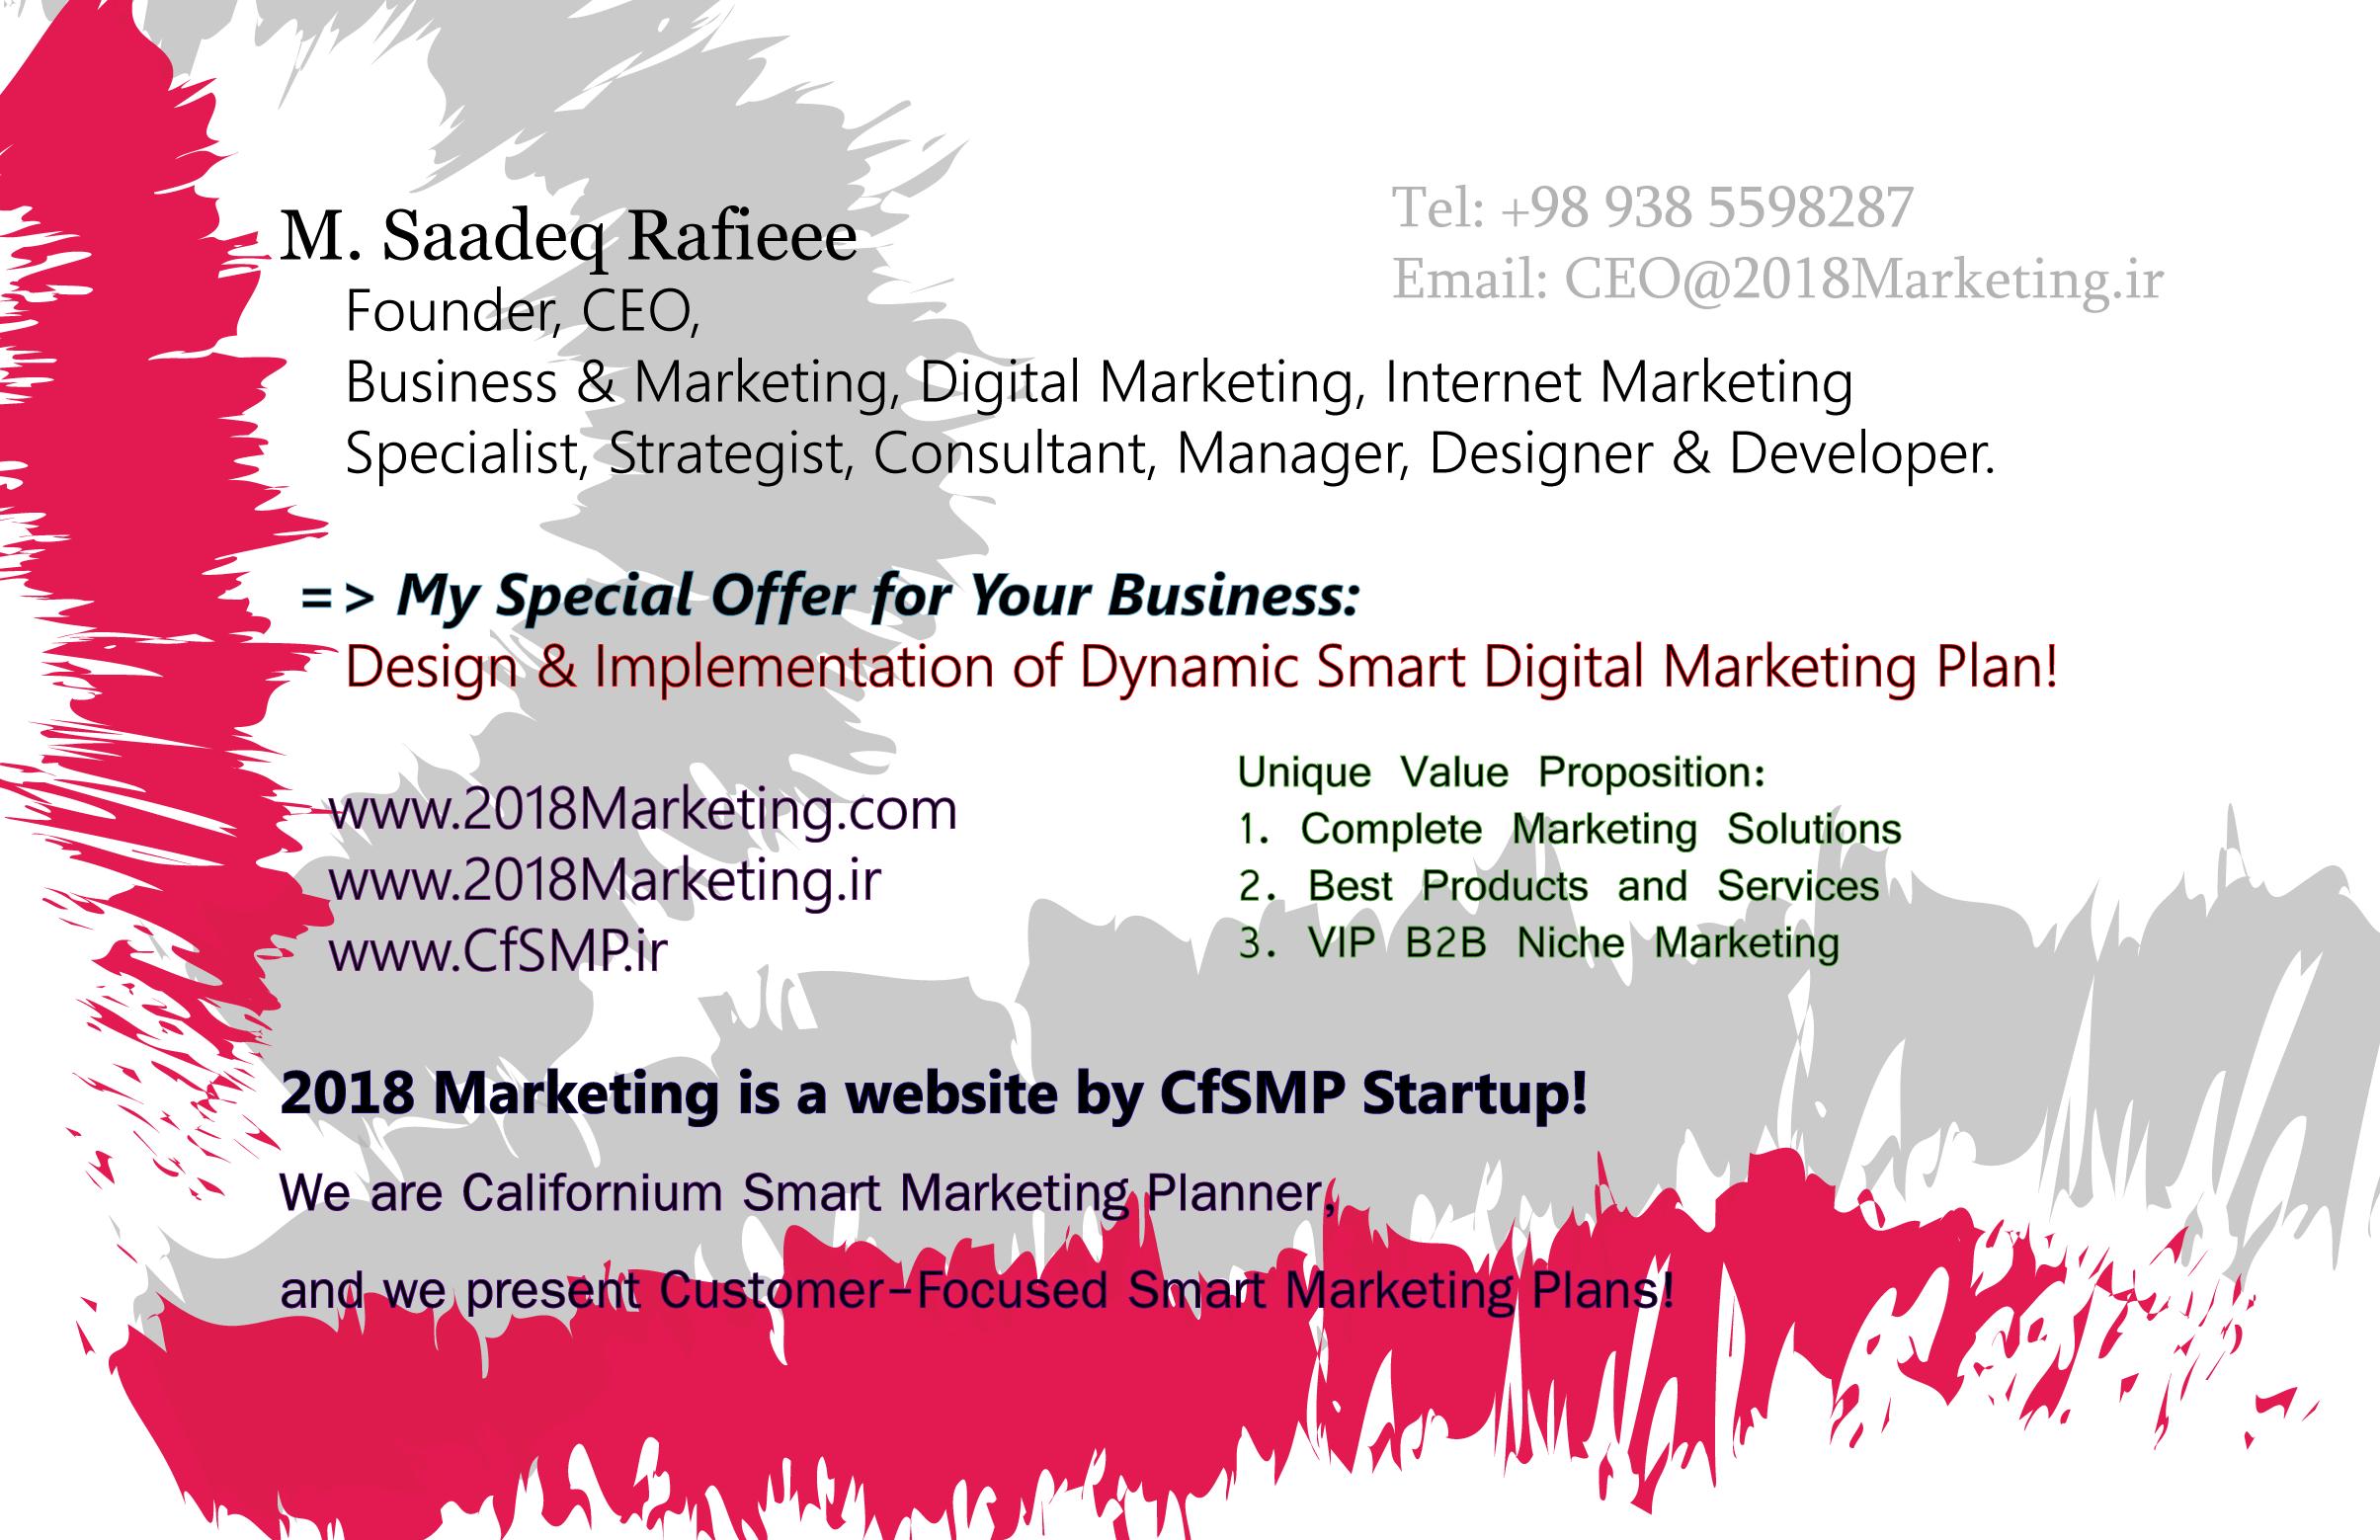 M. Saadeq Rafieee – CEO of 2018Marketing & CfSMP Network